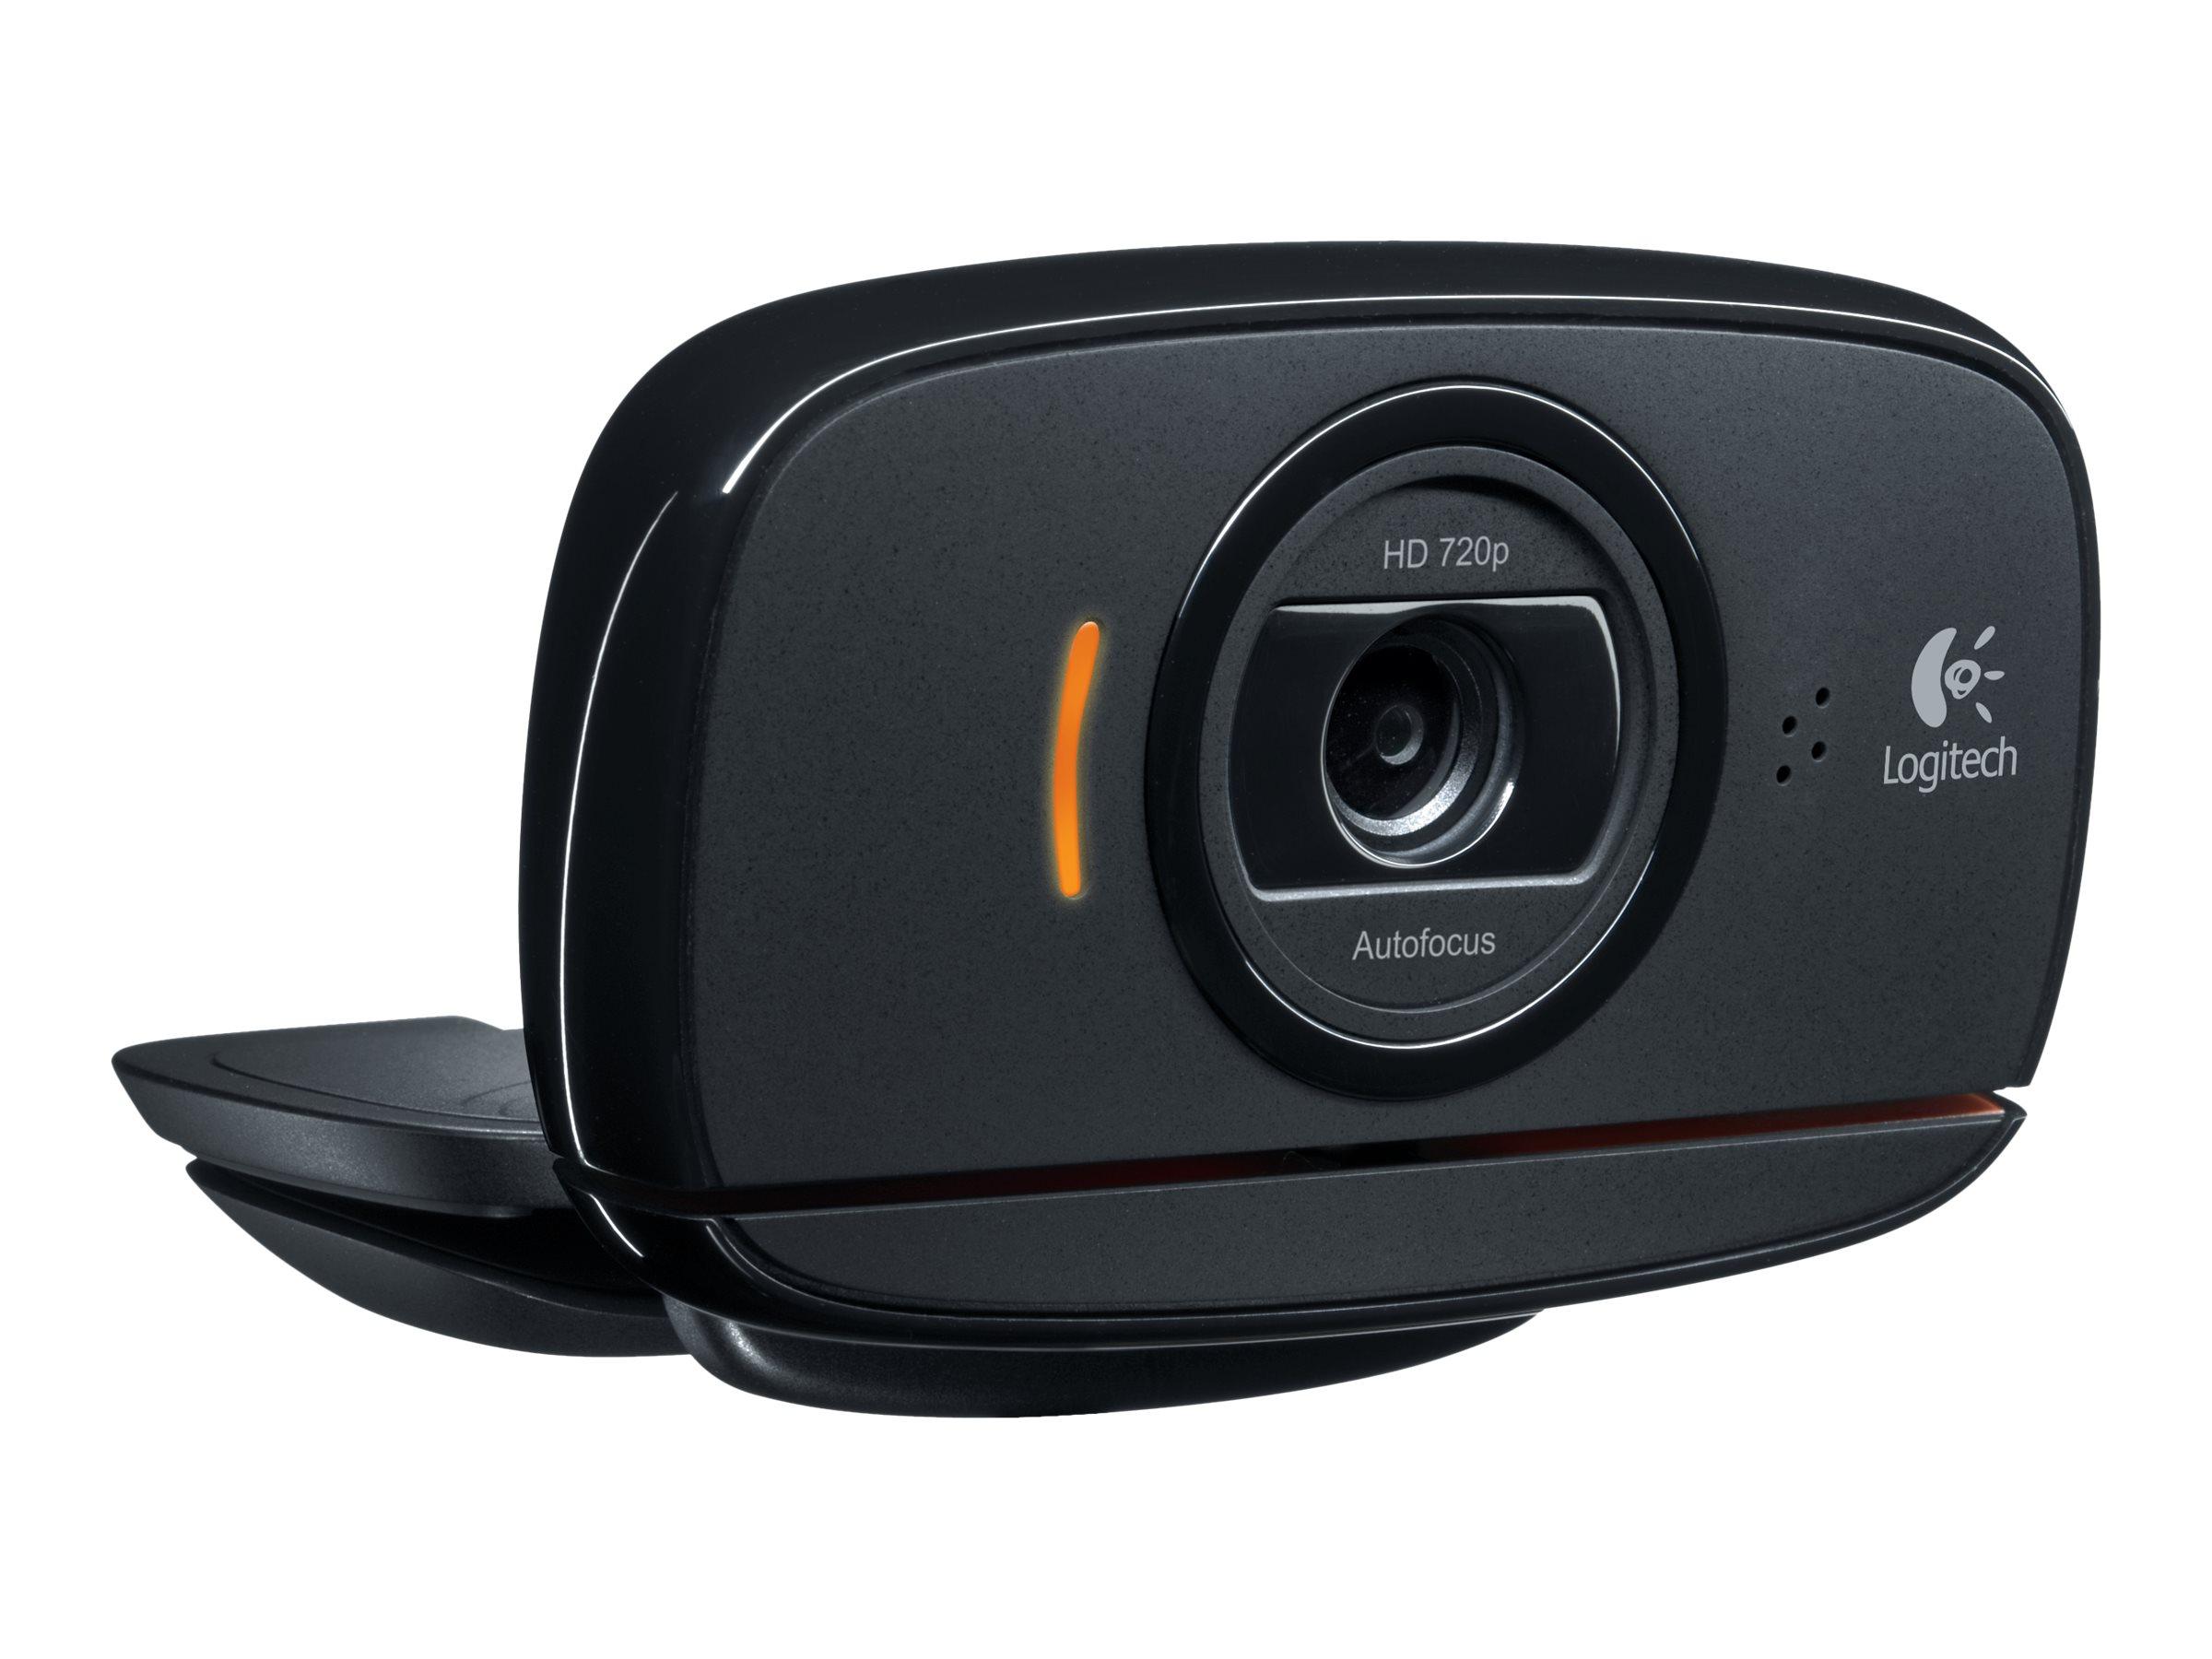 Logitech HD Webcam C525 - Web-Kamera - Farbe - 1280 x 720 - Audio - USB 2.0